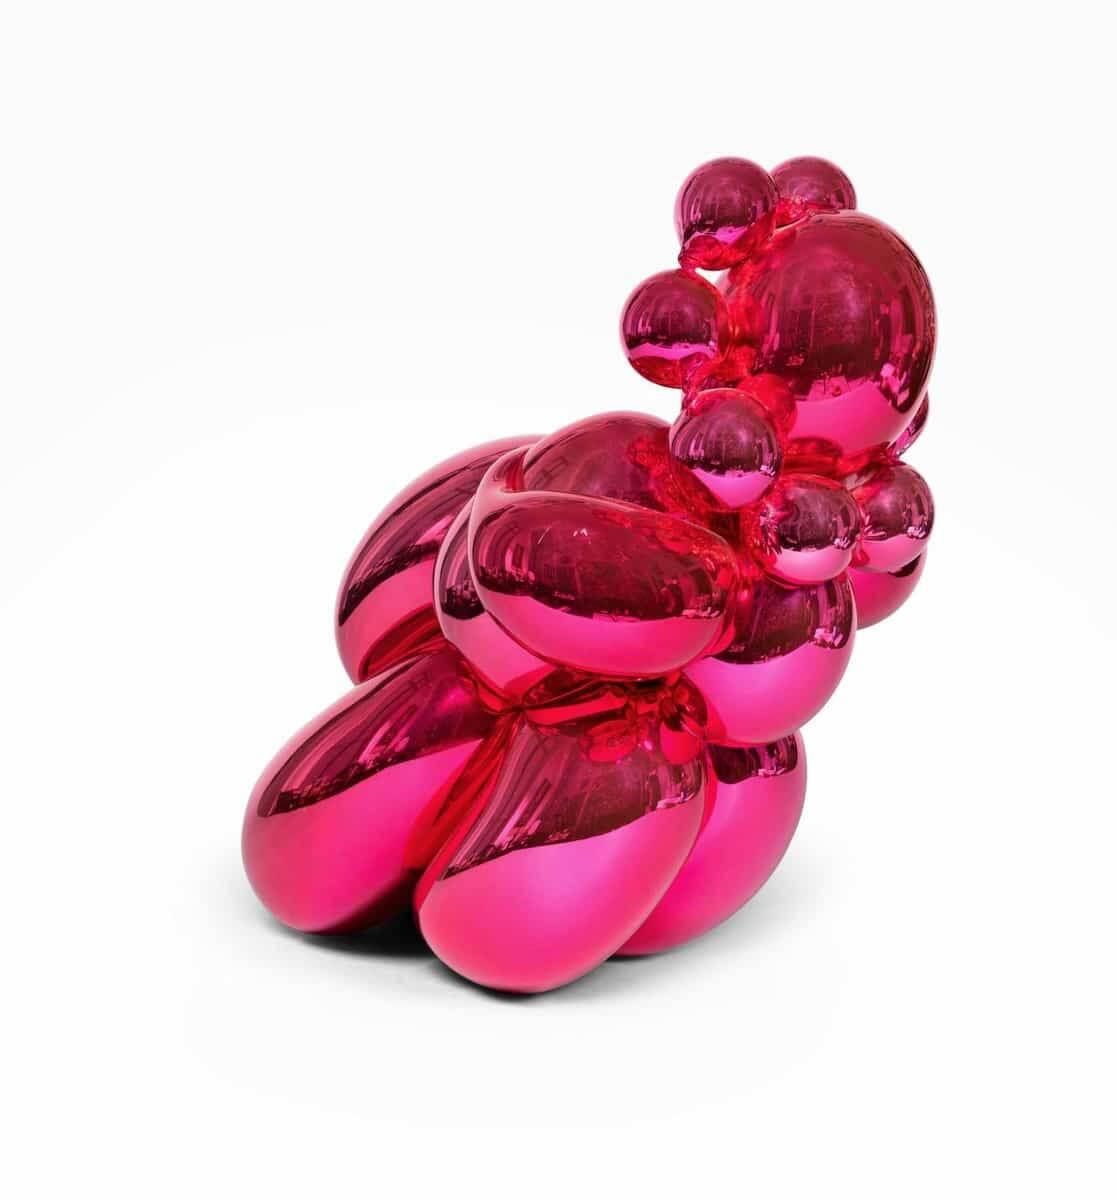 """Dom Pérignon Balloon Venus"" por Jeff Koons/ Divulgação: Sotheby's"